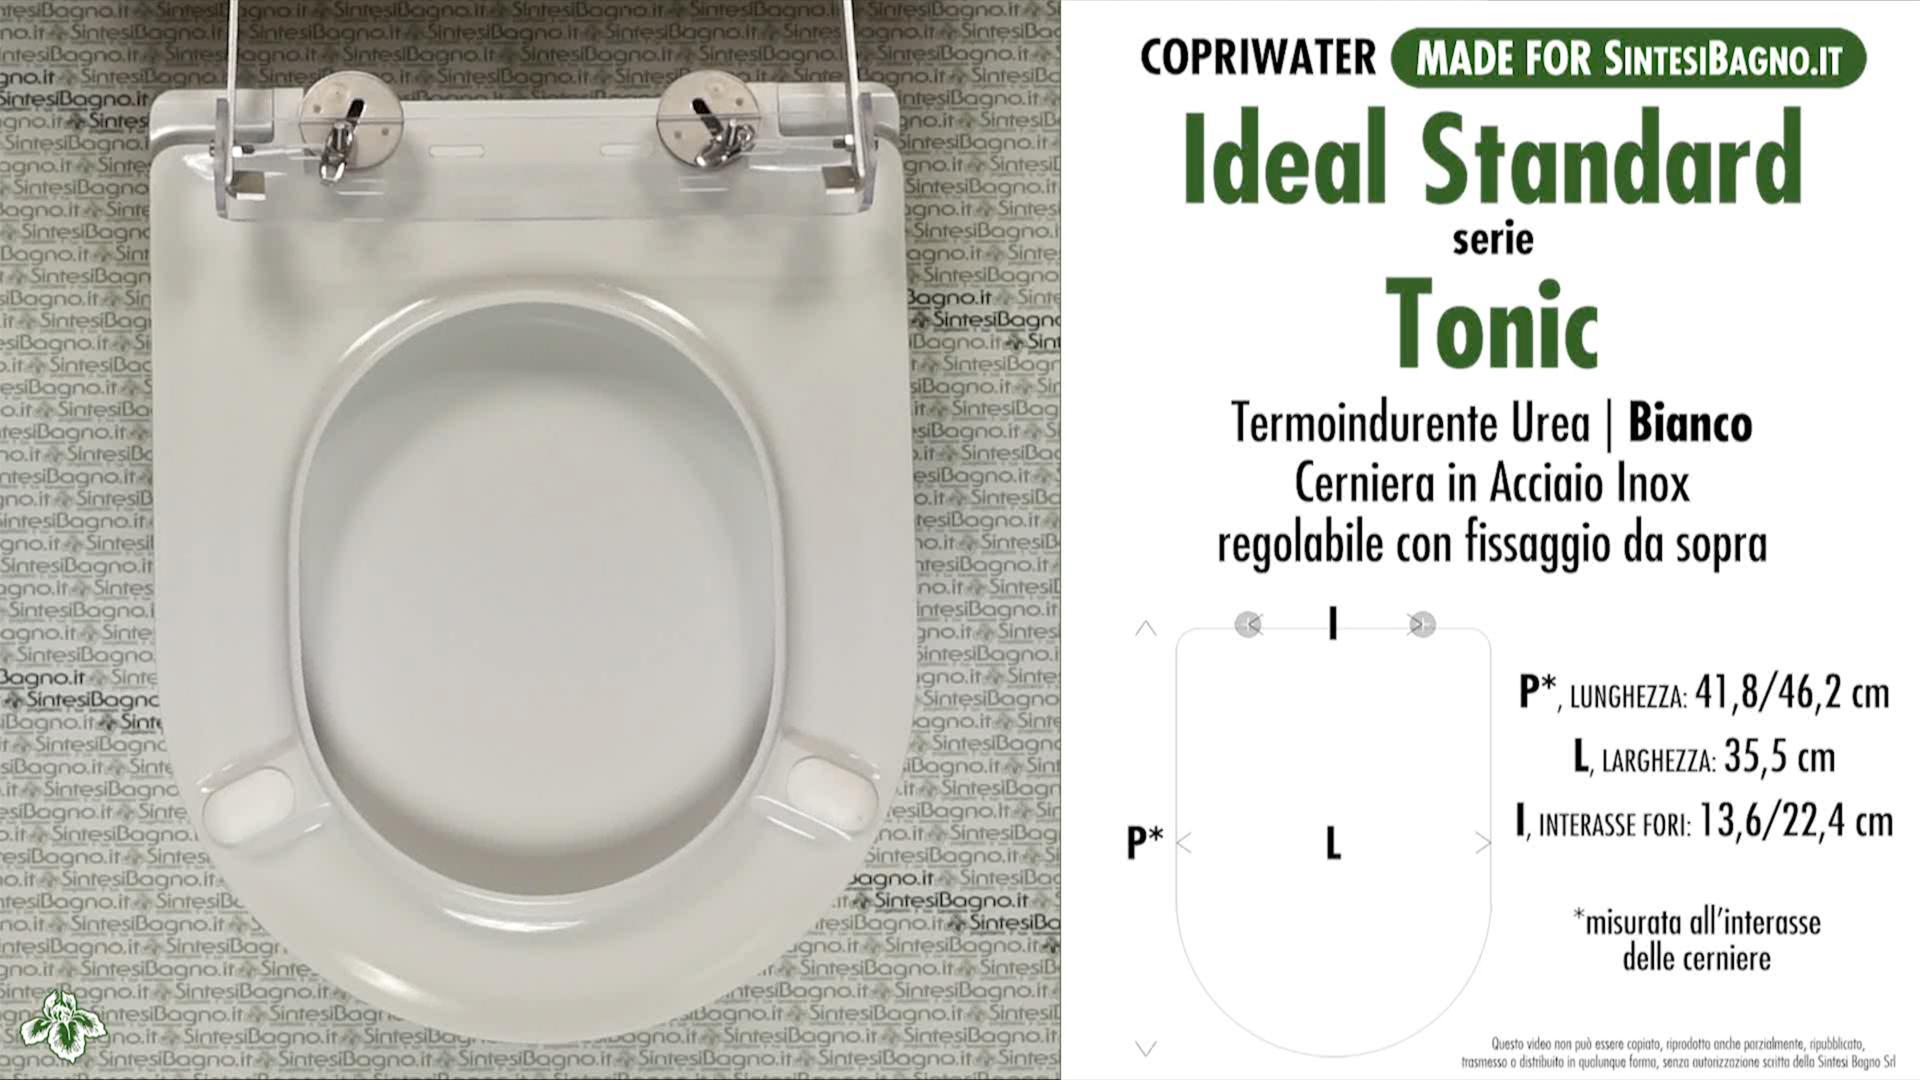 SCHEDA TECNICA MISURE copriwater IDEAL STANDARD TONIC